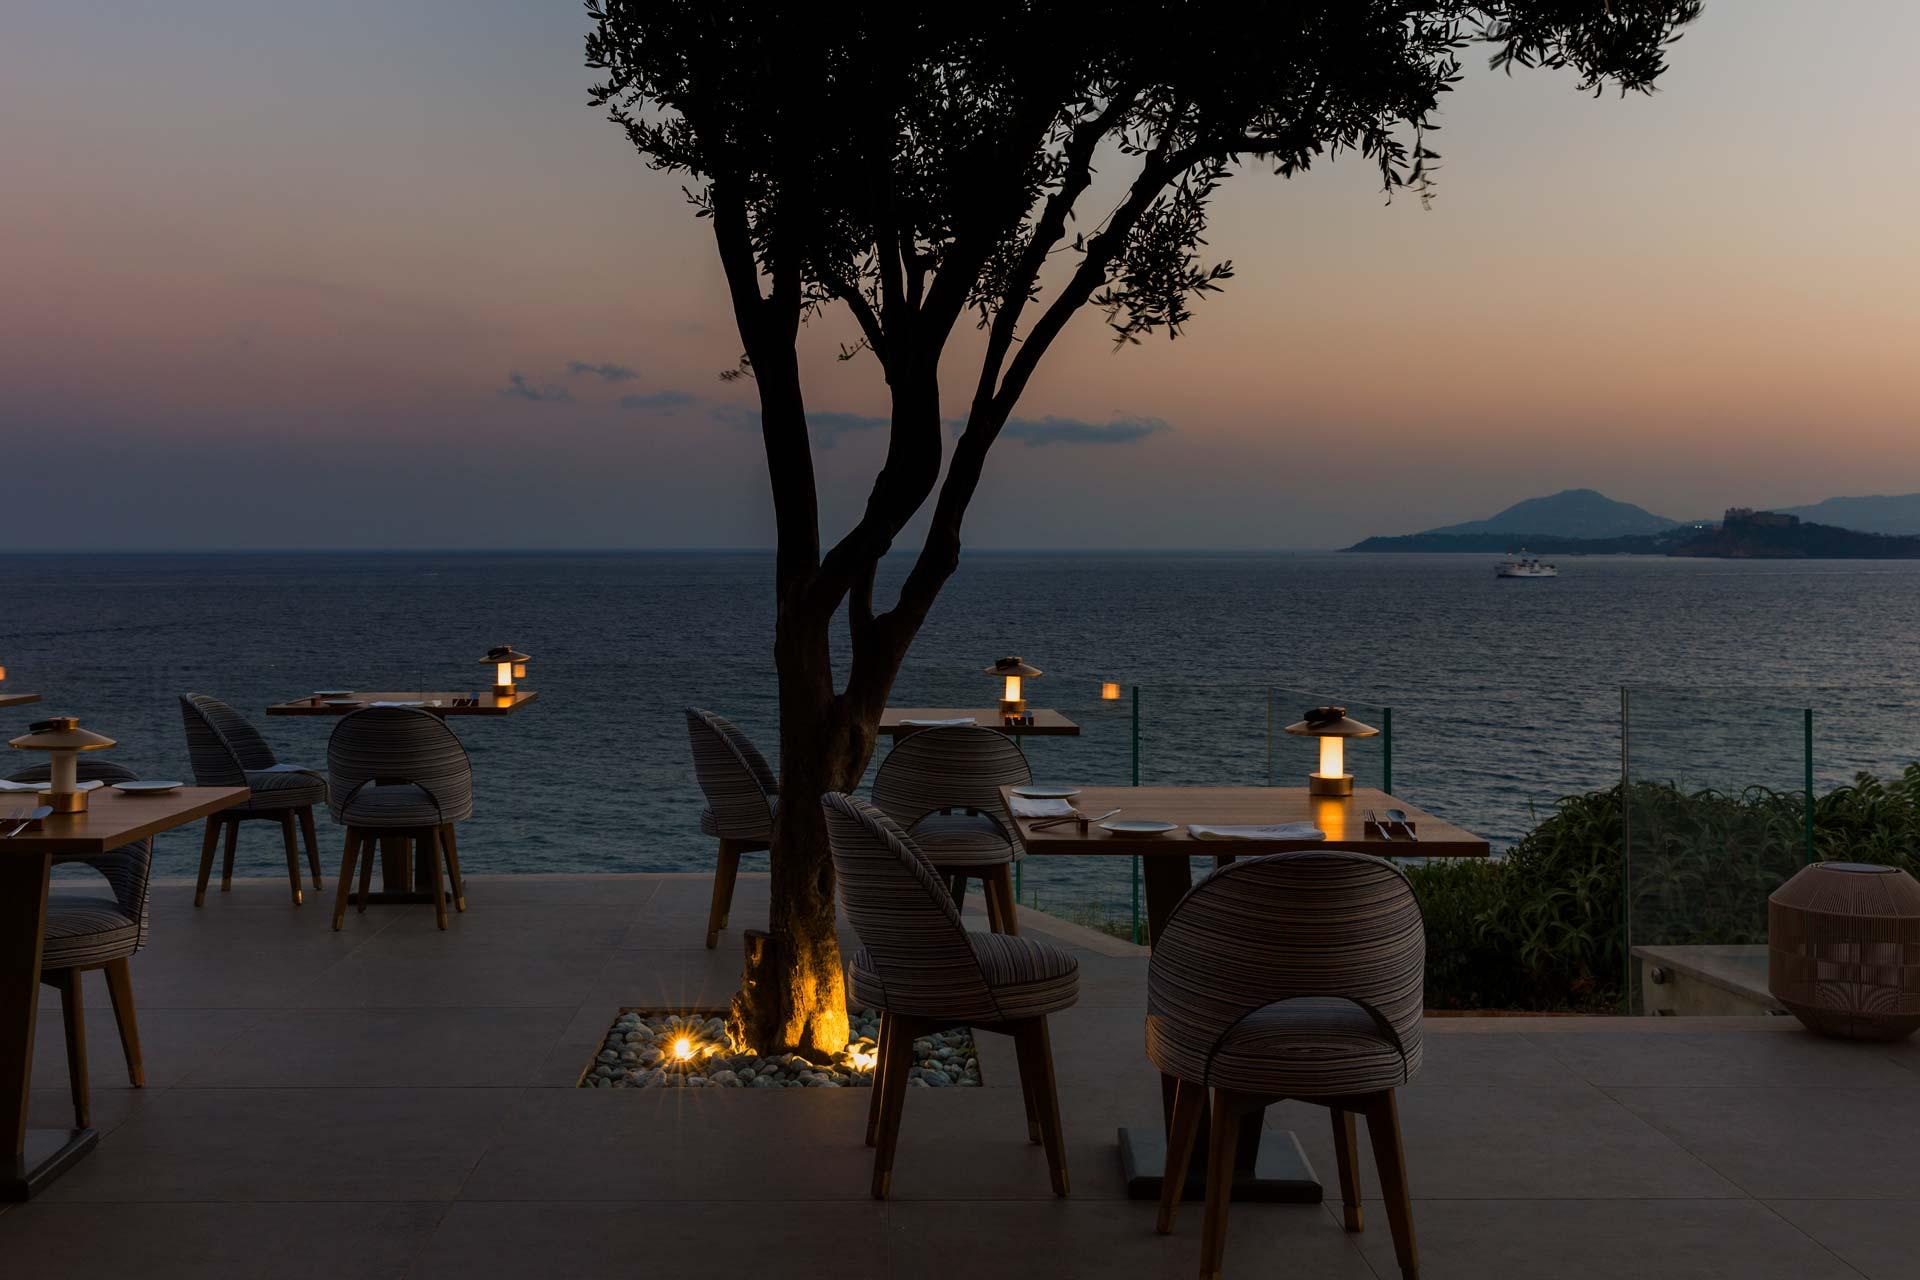 Caracol Ristorante Gourmet Con Anima Mediterranea